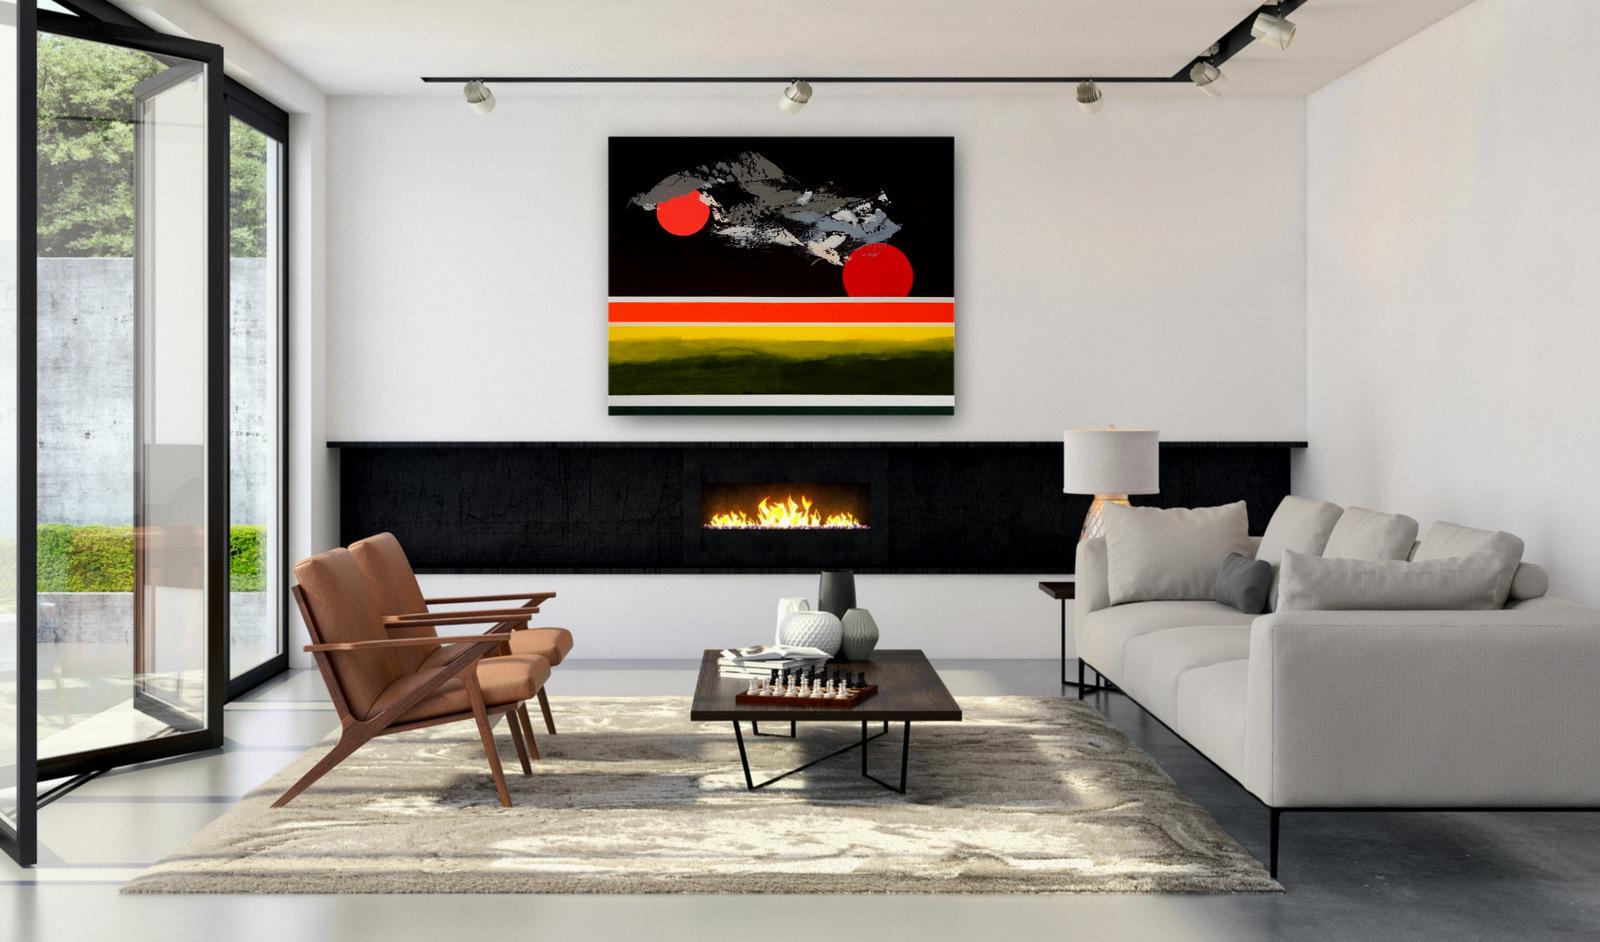 2-Abstract Painting, Bill Boyd, Contemporary Art-001.jpg